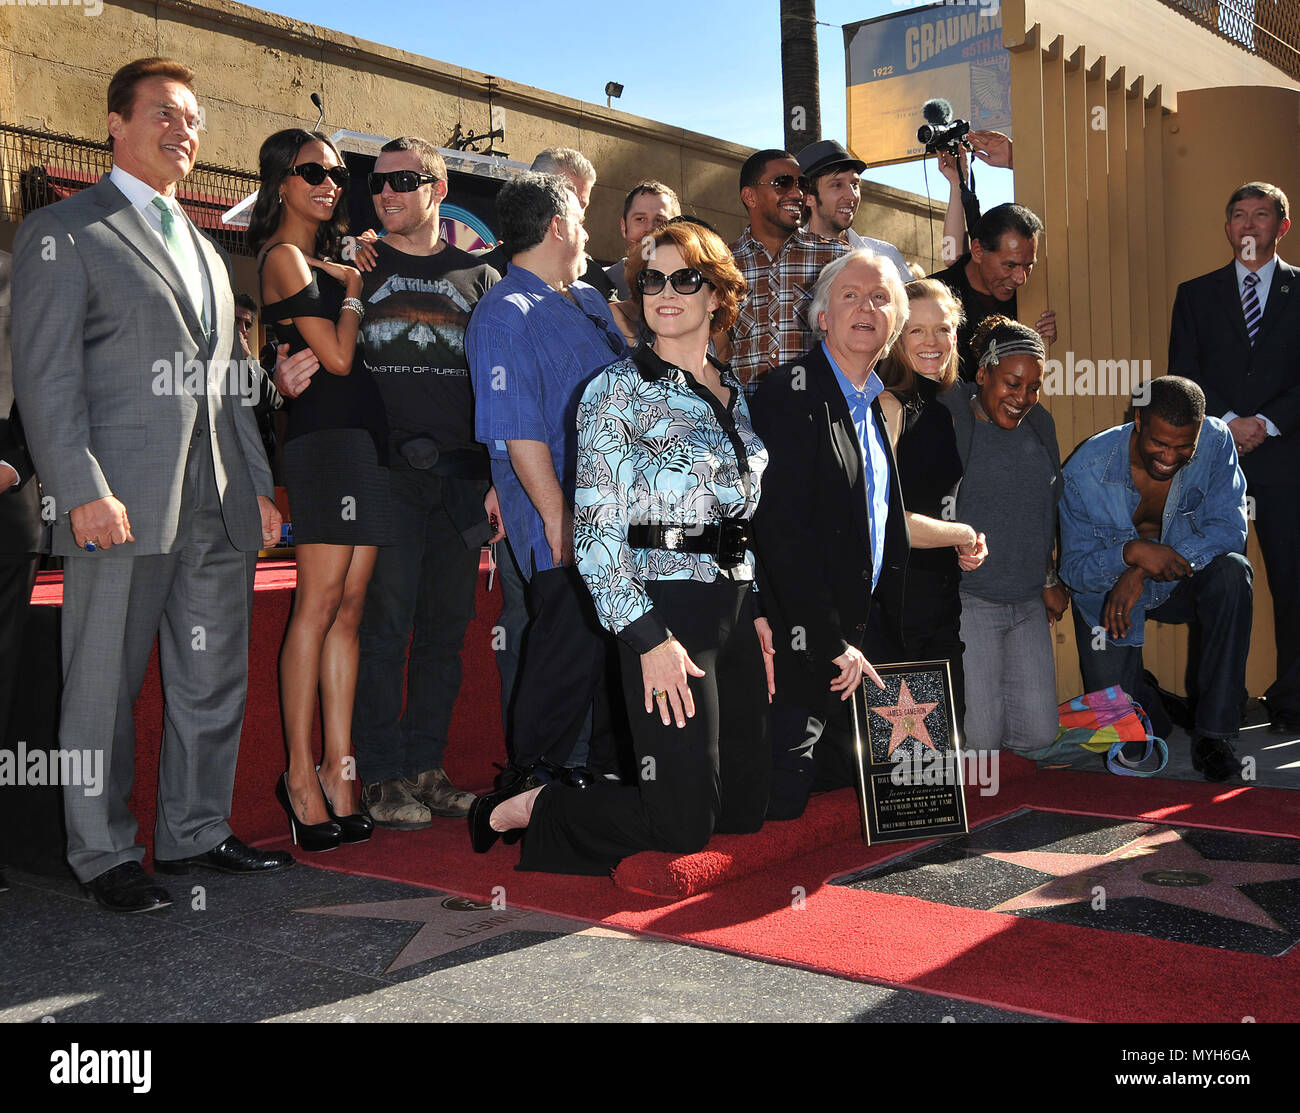 Cast Of Avatar Stars: Sigourney Weaver And Arnold Schwarzenegger Stock Photos